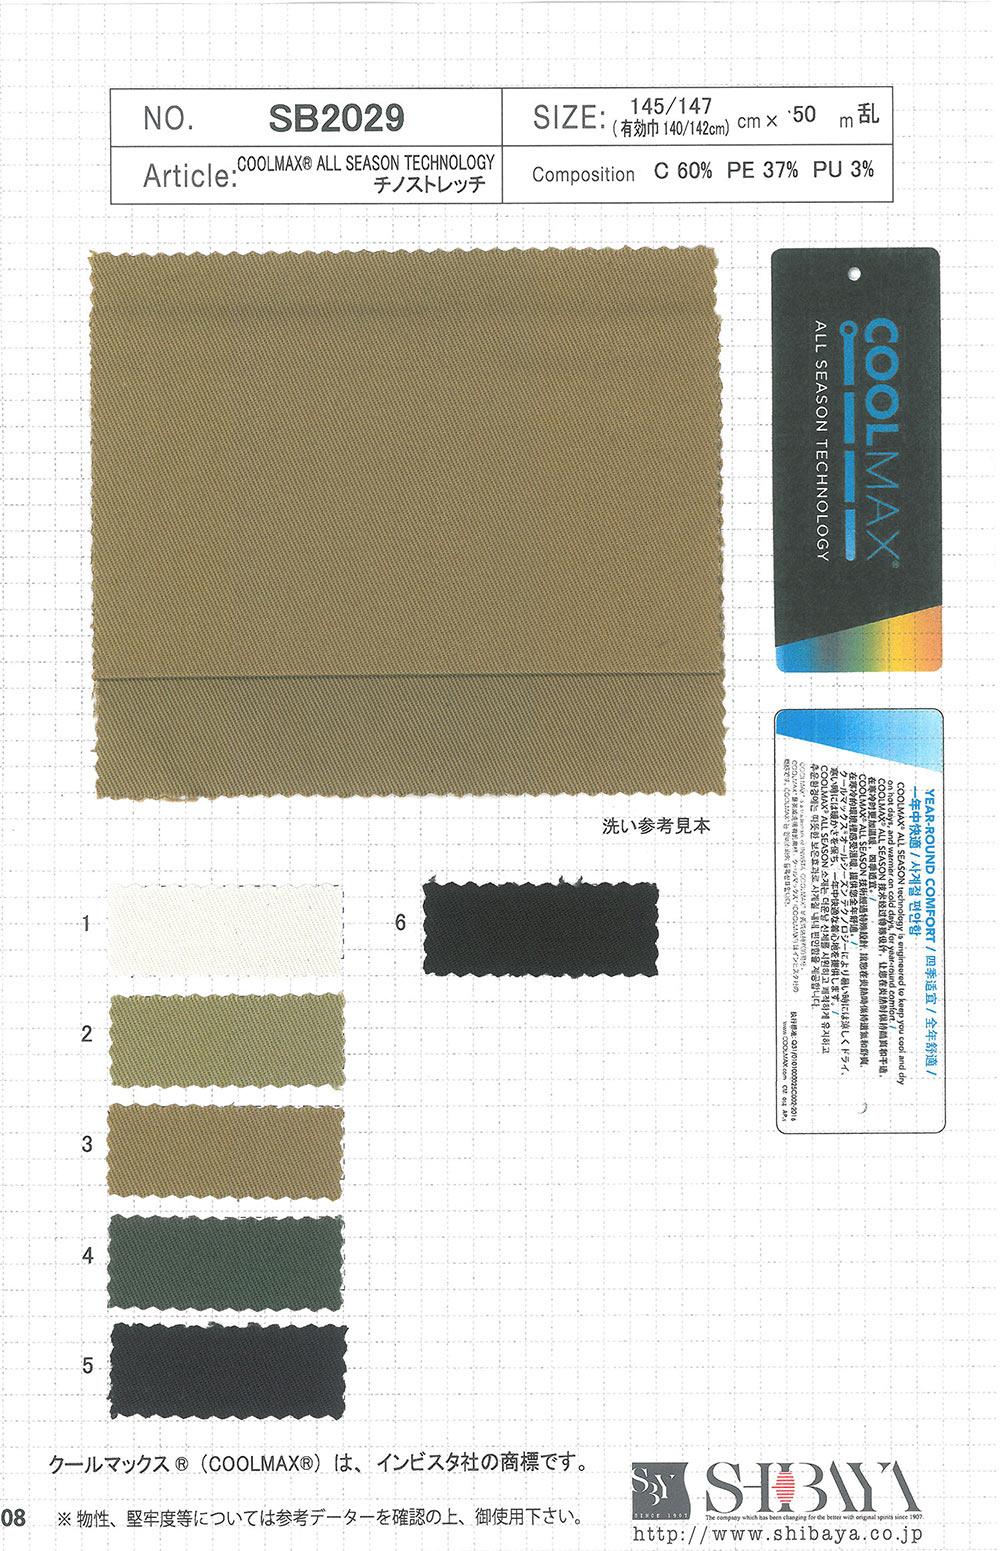 SB2029 COOLMAX ALL SEASON TECHNOLOGY チノストレッチ[生地] 柴屋/オークラ商事 - ApparelX アパレル資材卸通販